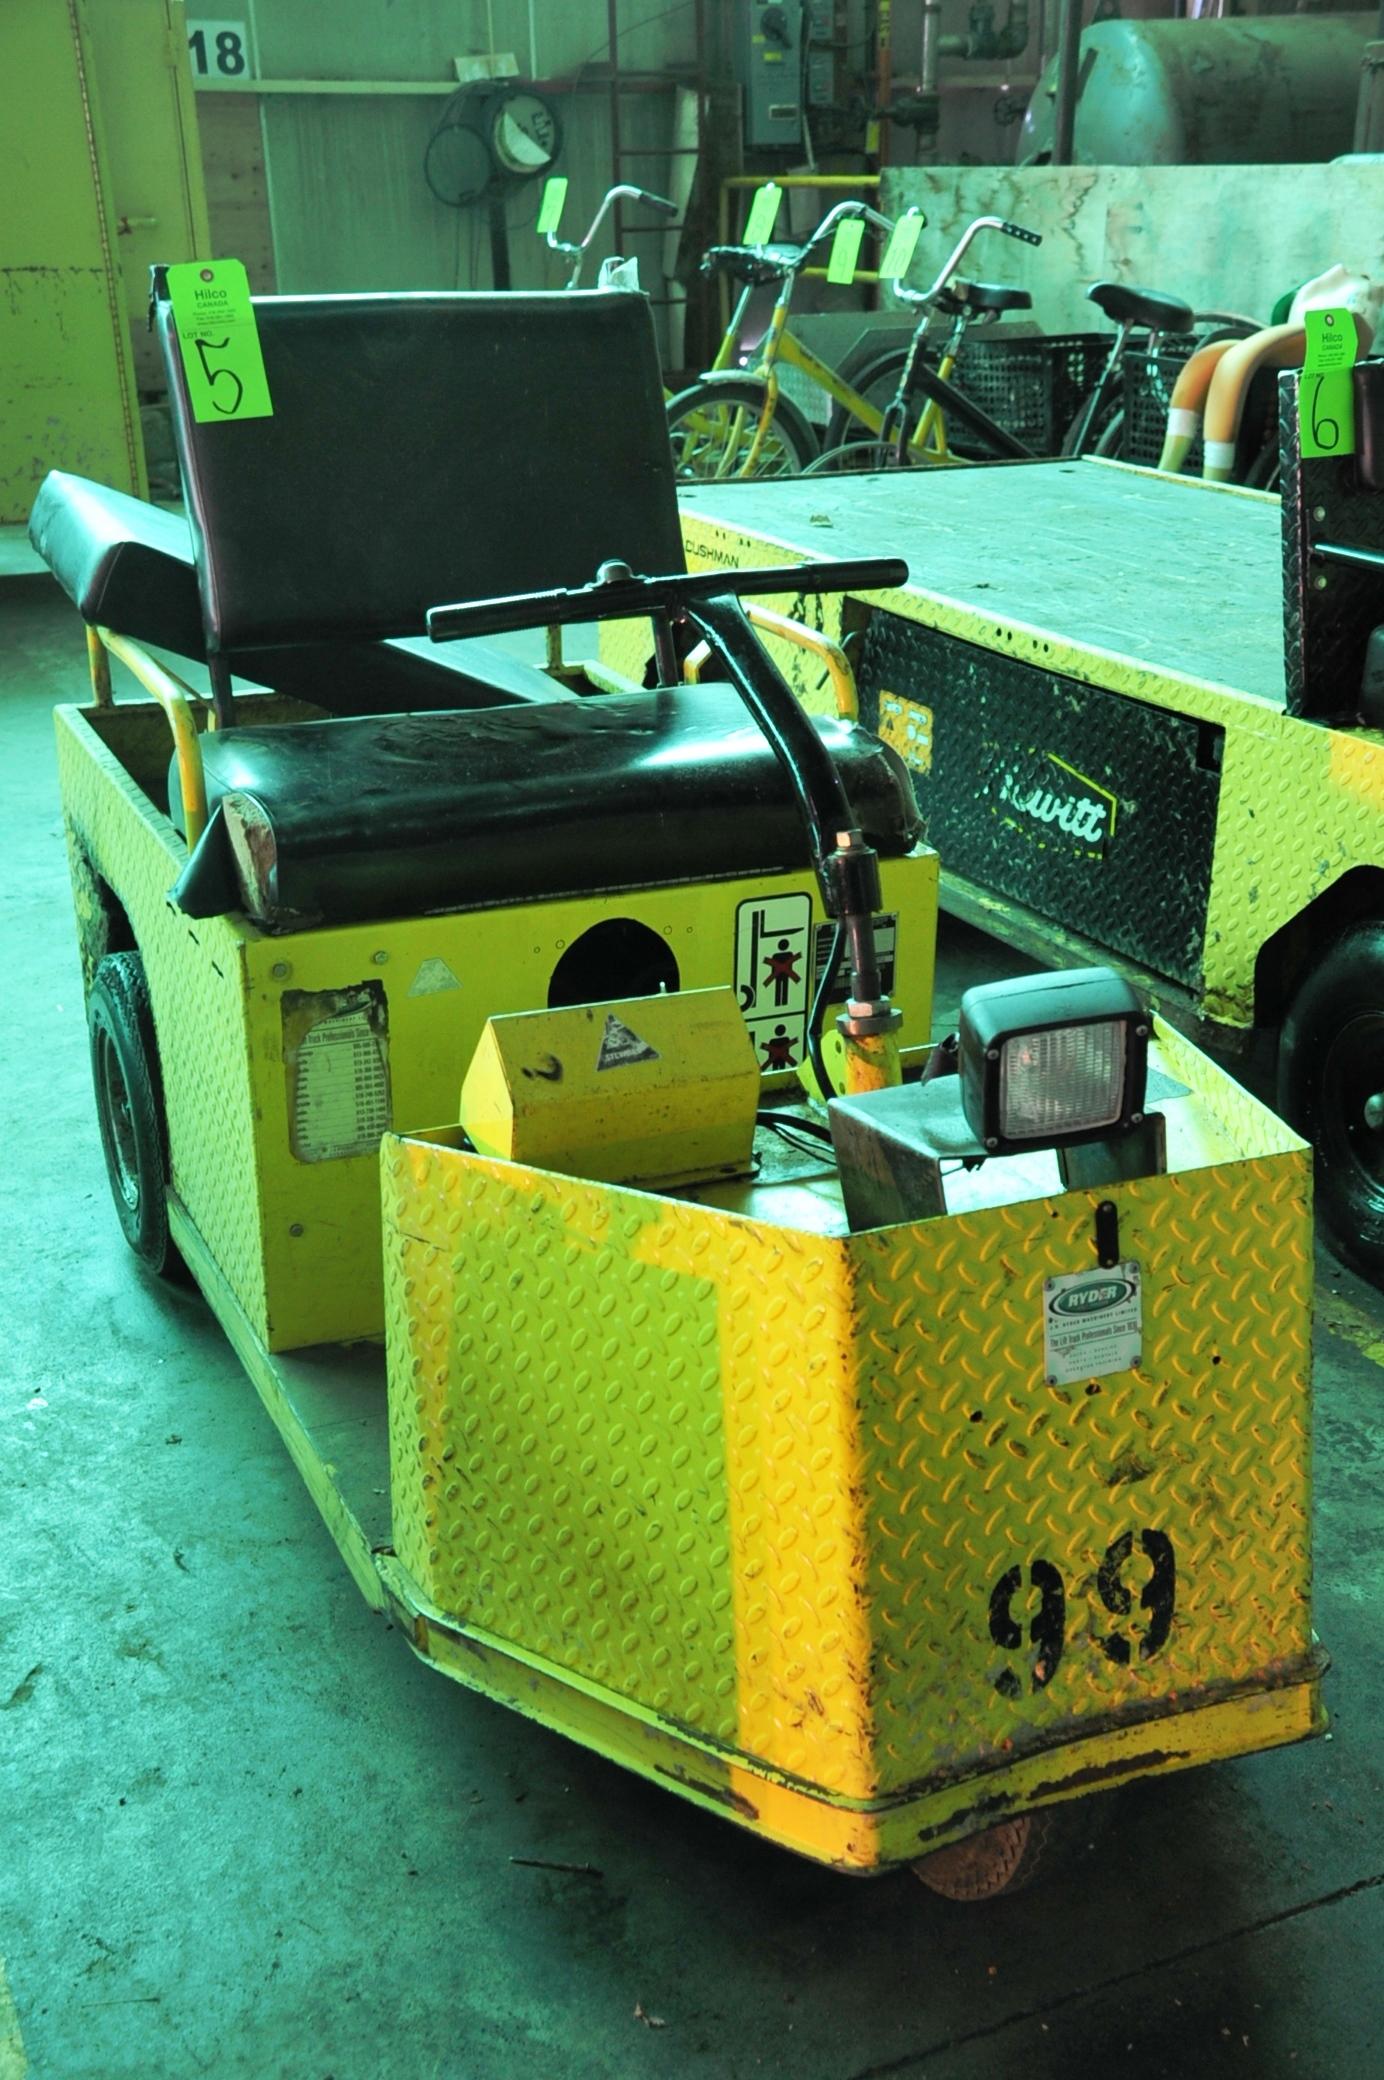 Lot 5 - Cushman Model Minute Miser Electric Powered Cart